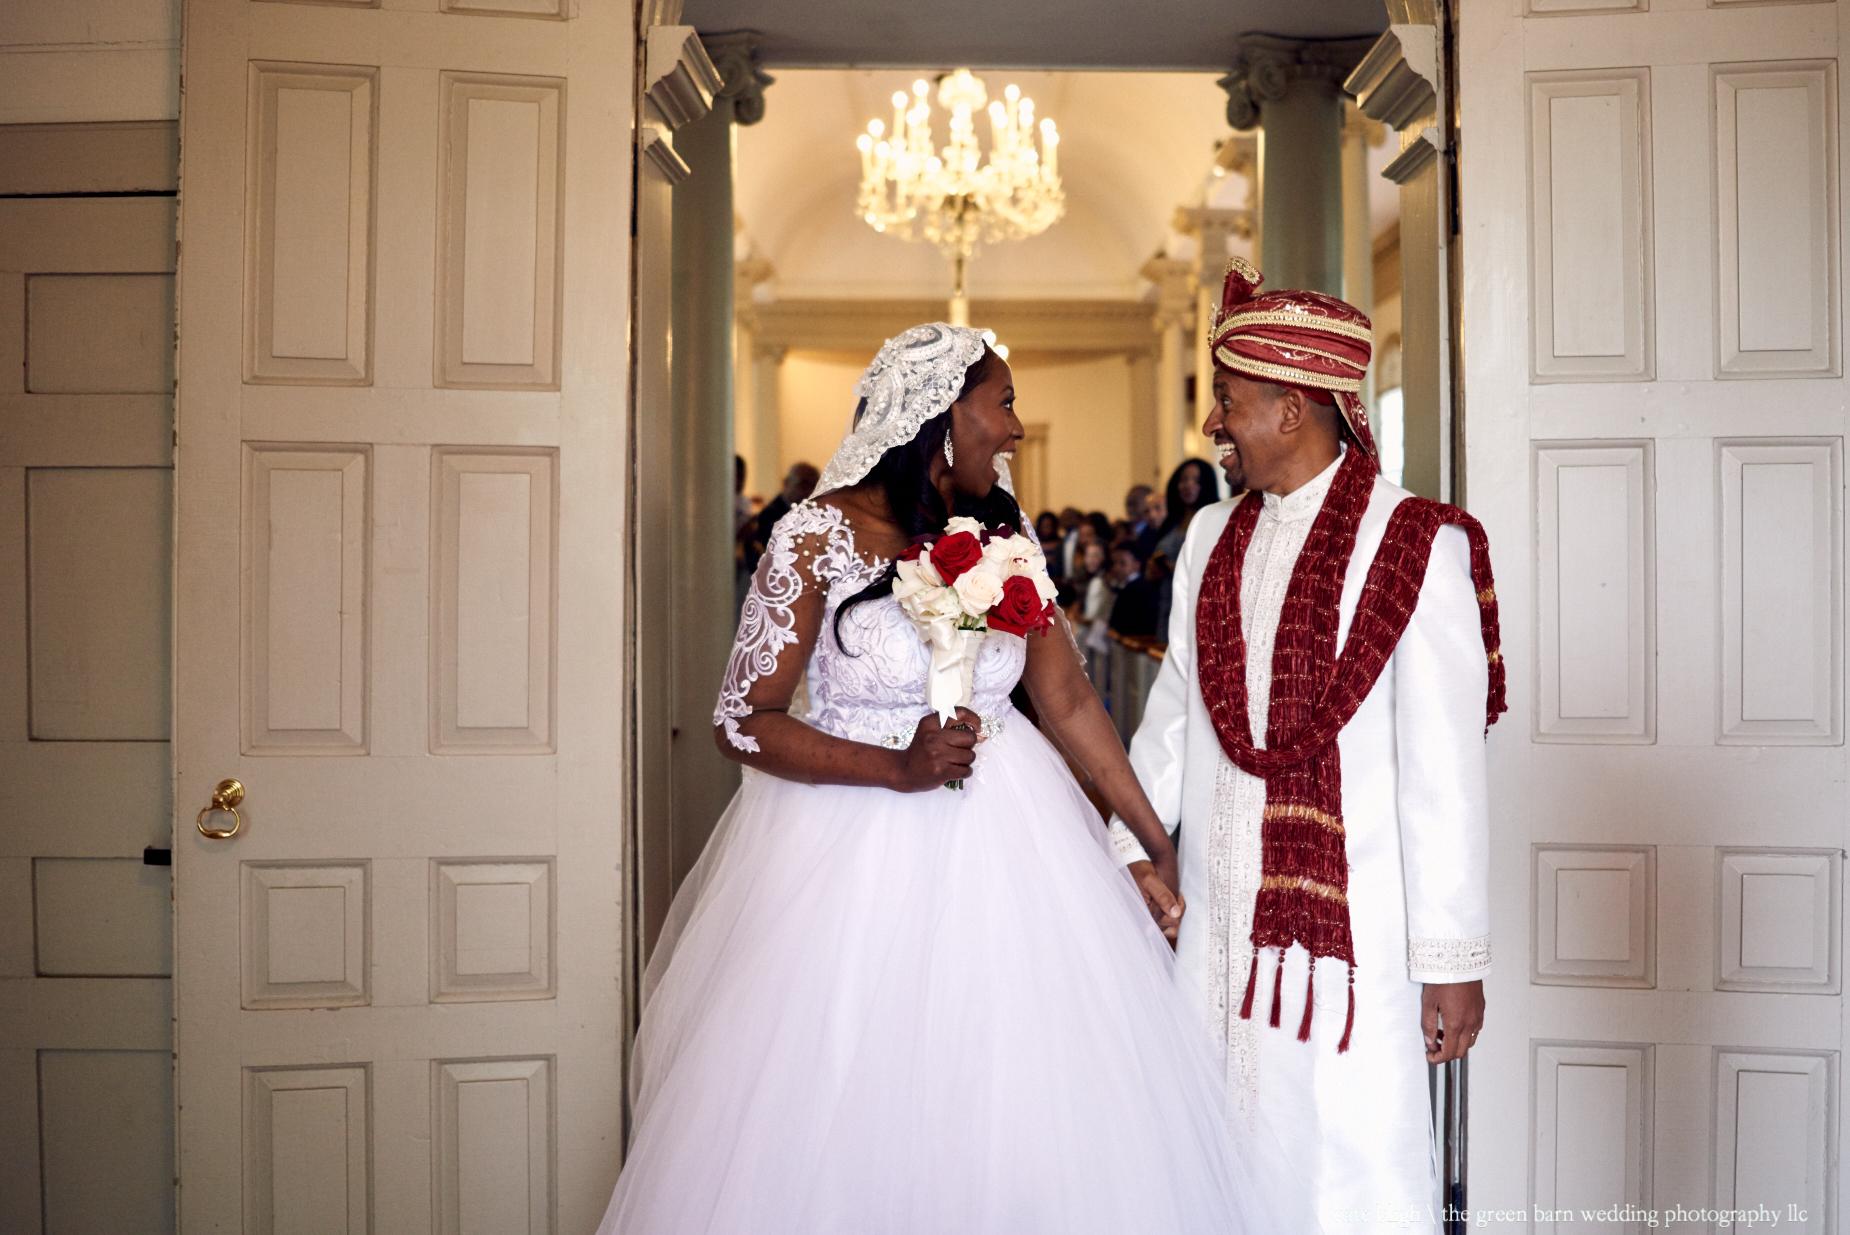 Serah and Onche's wedding at Christ's Church in Cambridge, Massachusetts